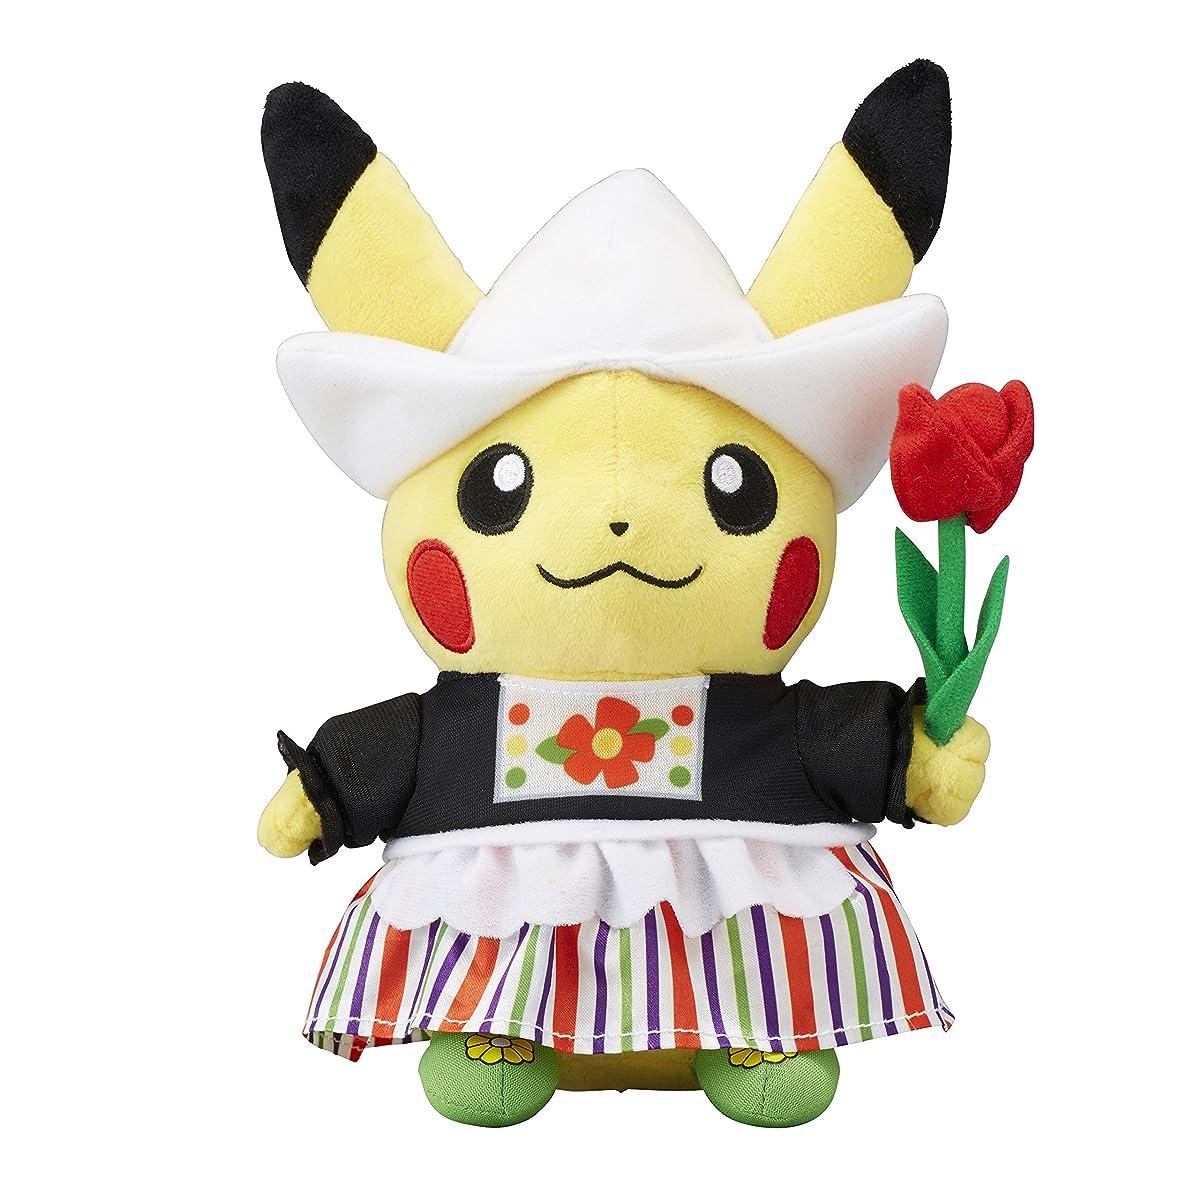 Garchomp Gaburias Plush Doll S Pokemon Center Japan Original